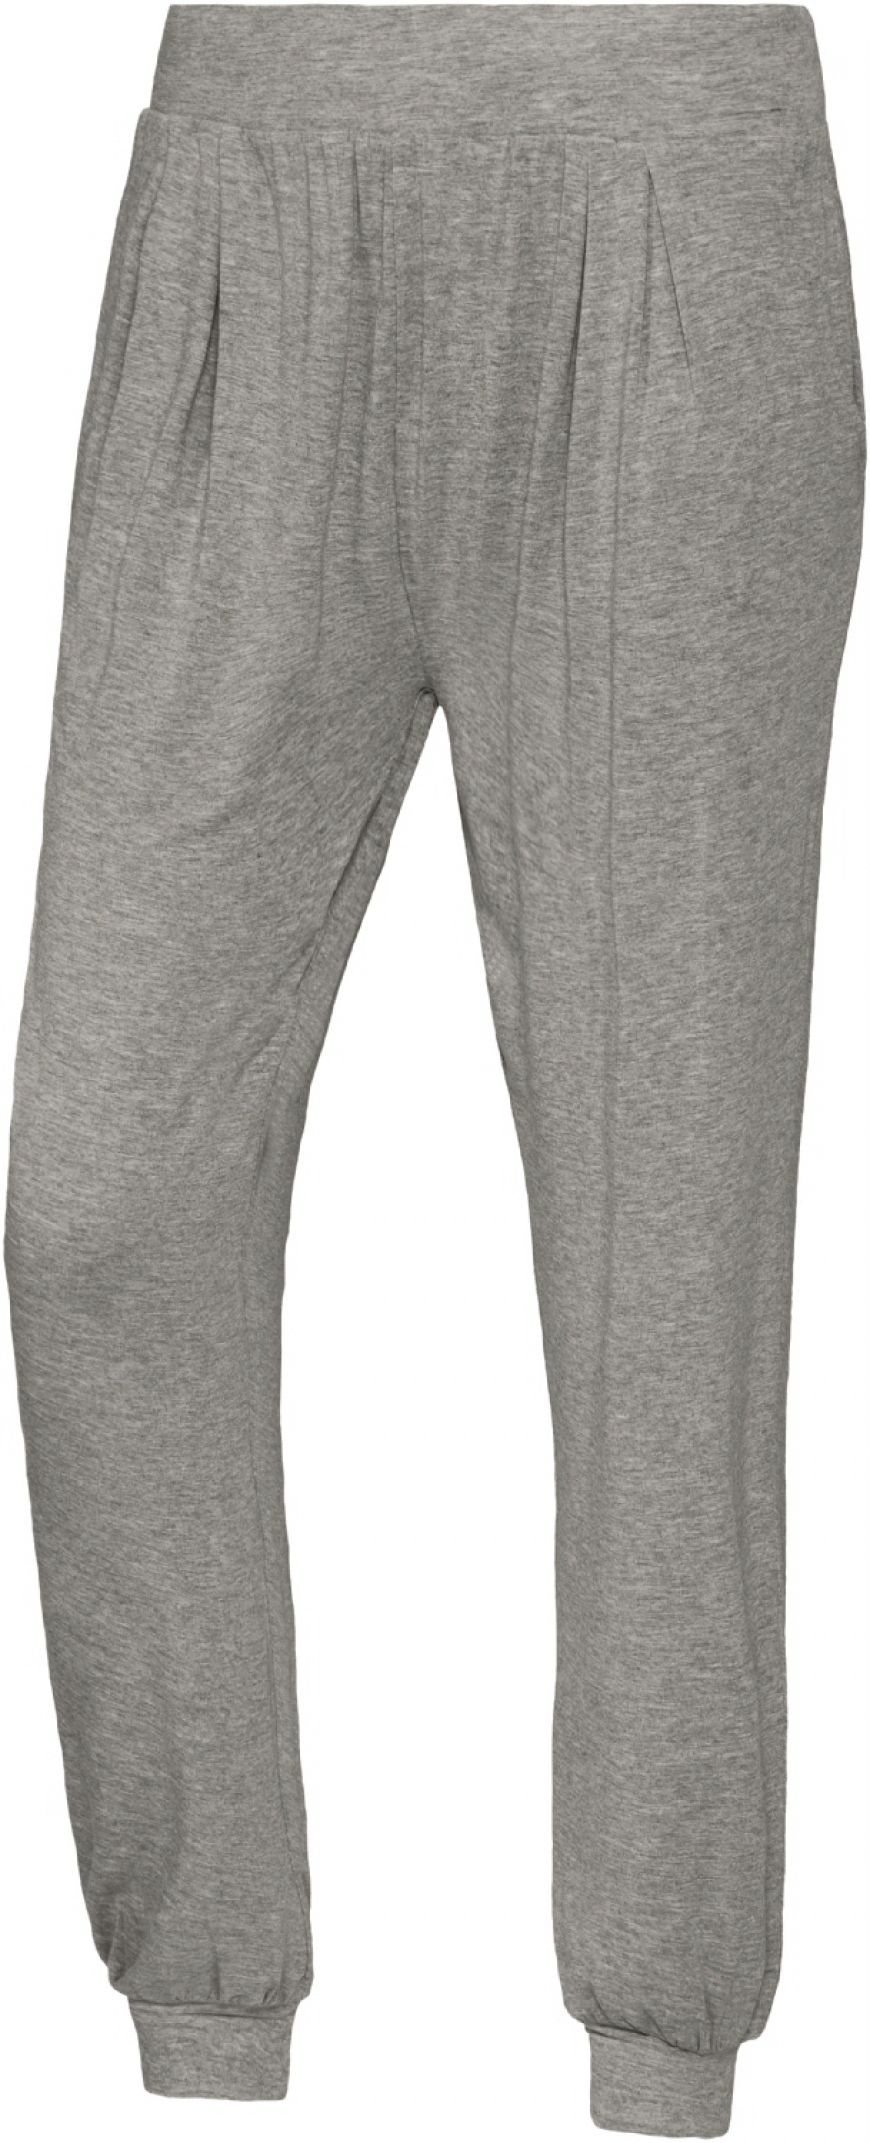 Ladies Yoga Pants 2 7 99 1